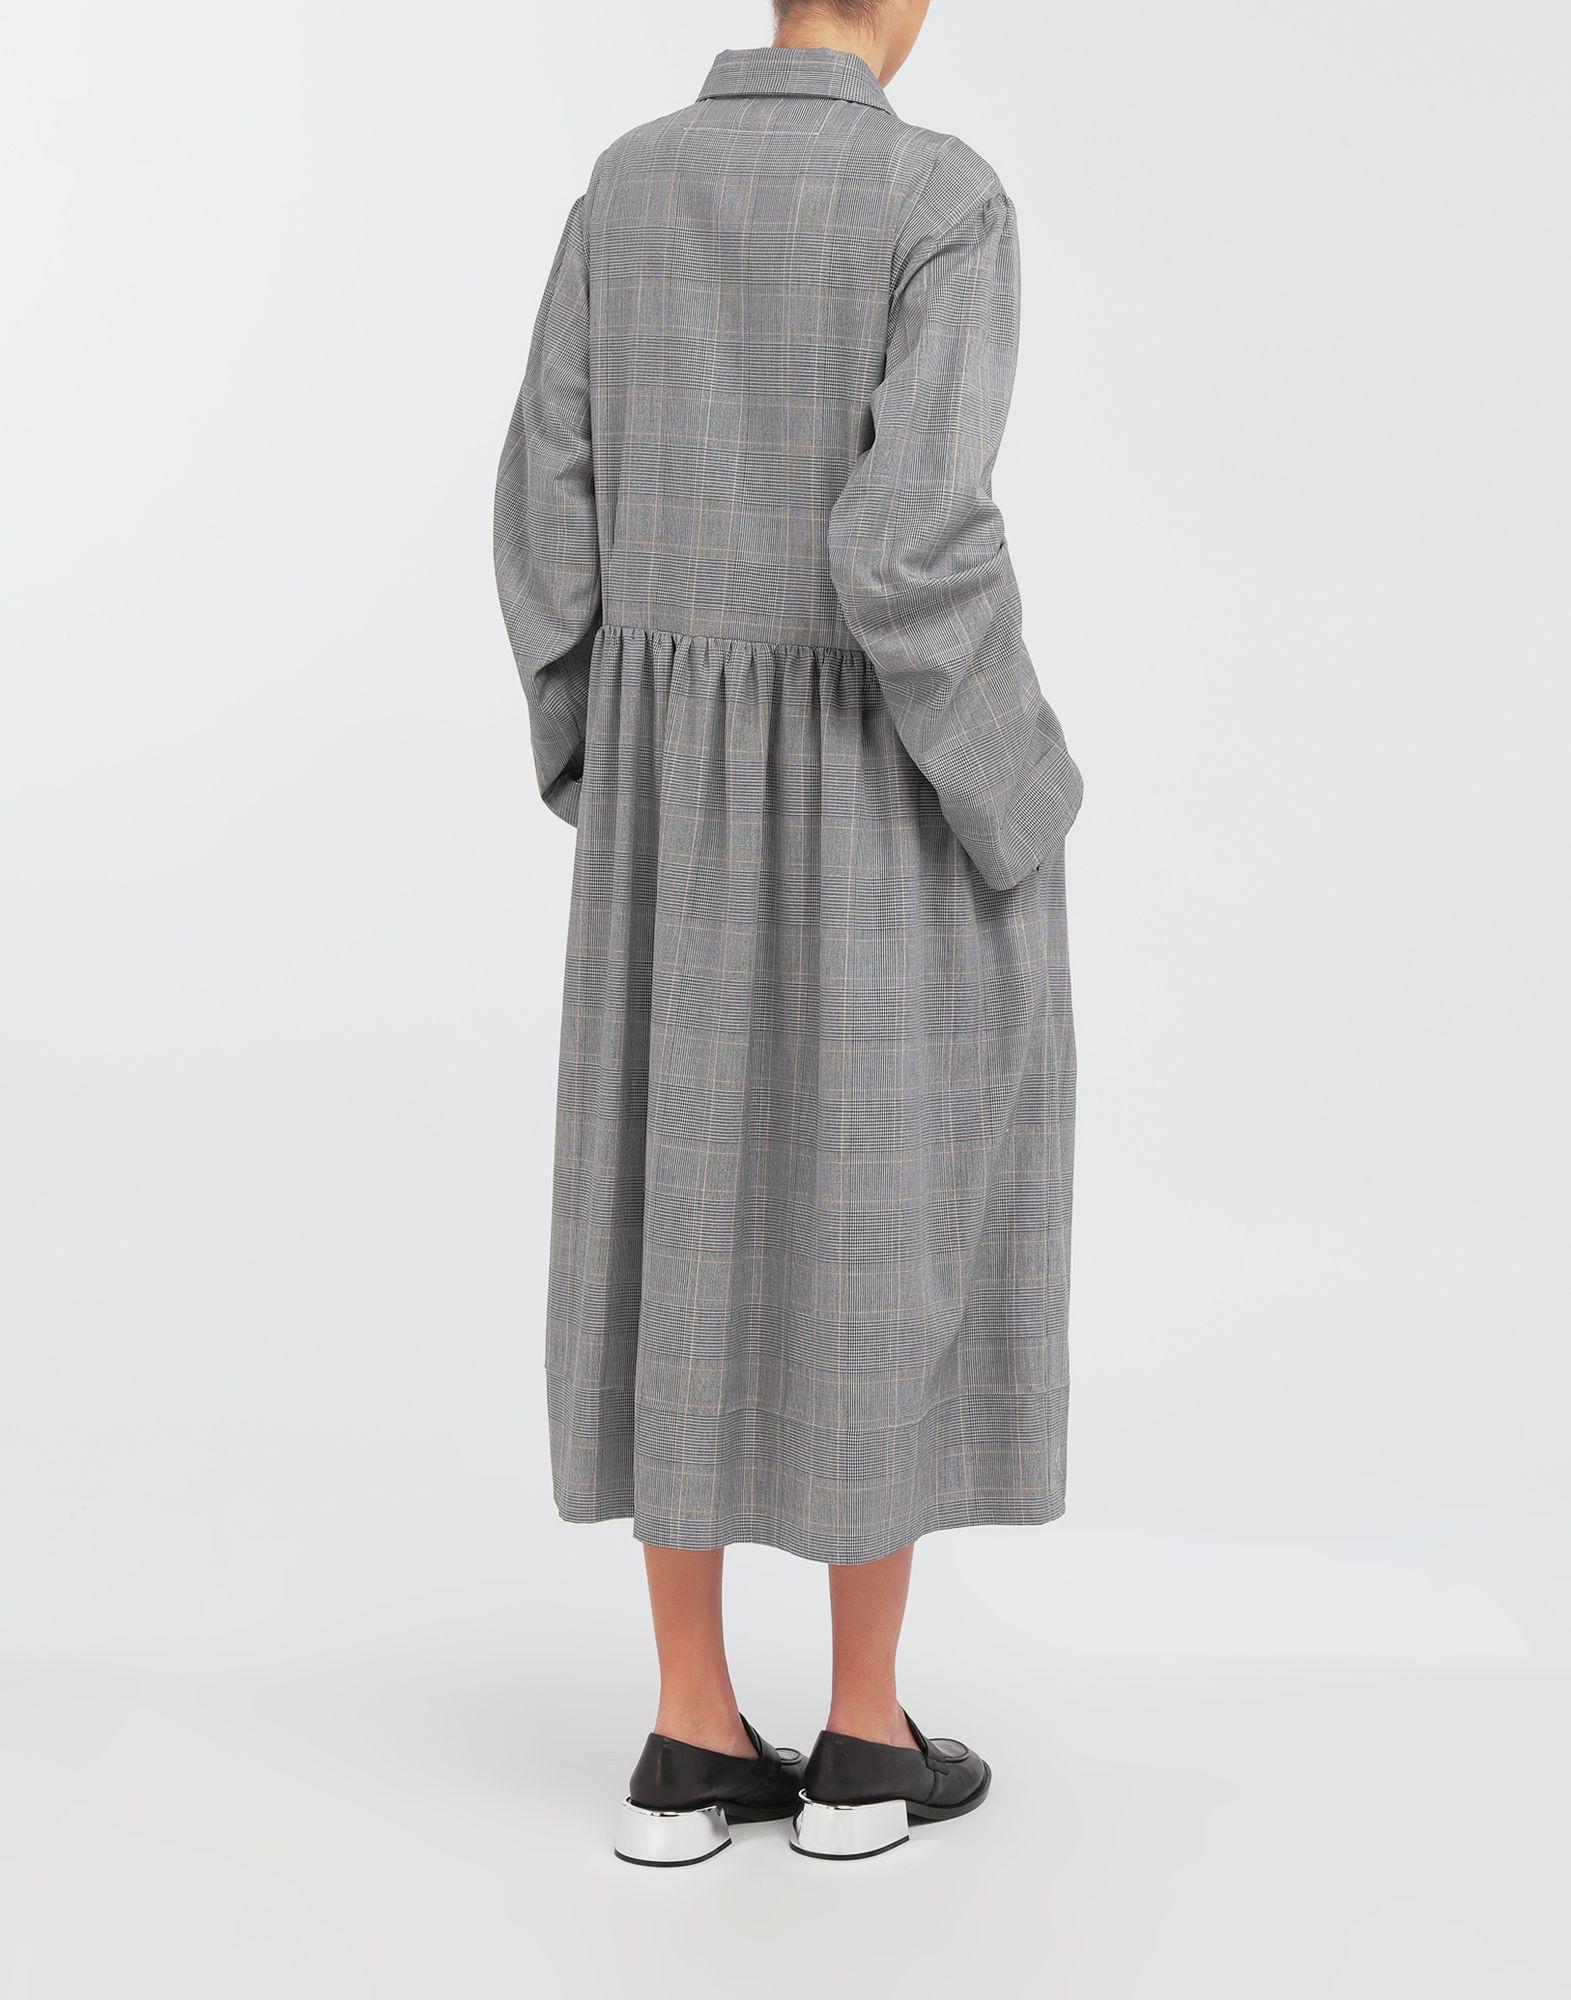 MM6 MAISON MARGIELA Checked necktie maxi dress 3/4 length dress Woman e